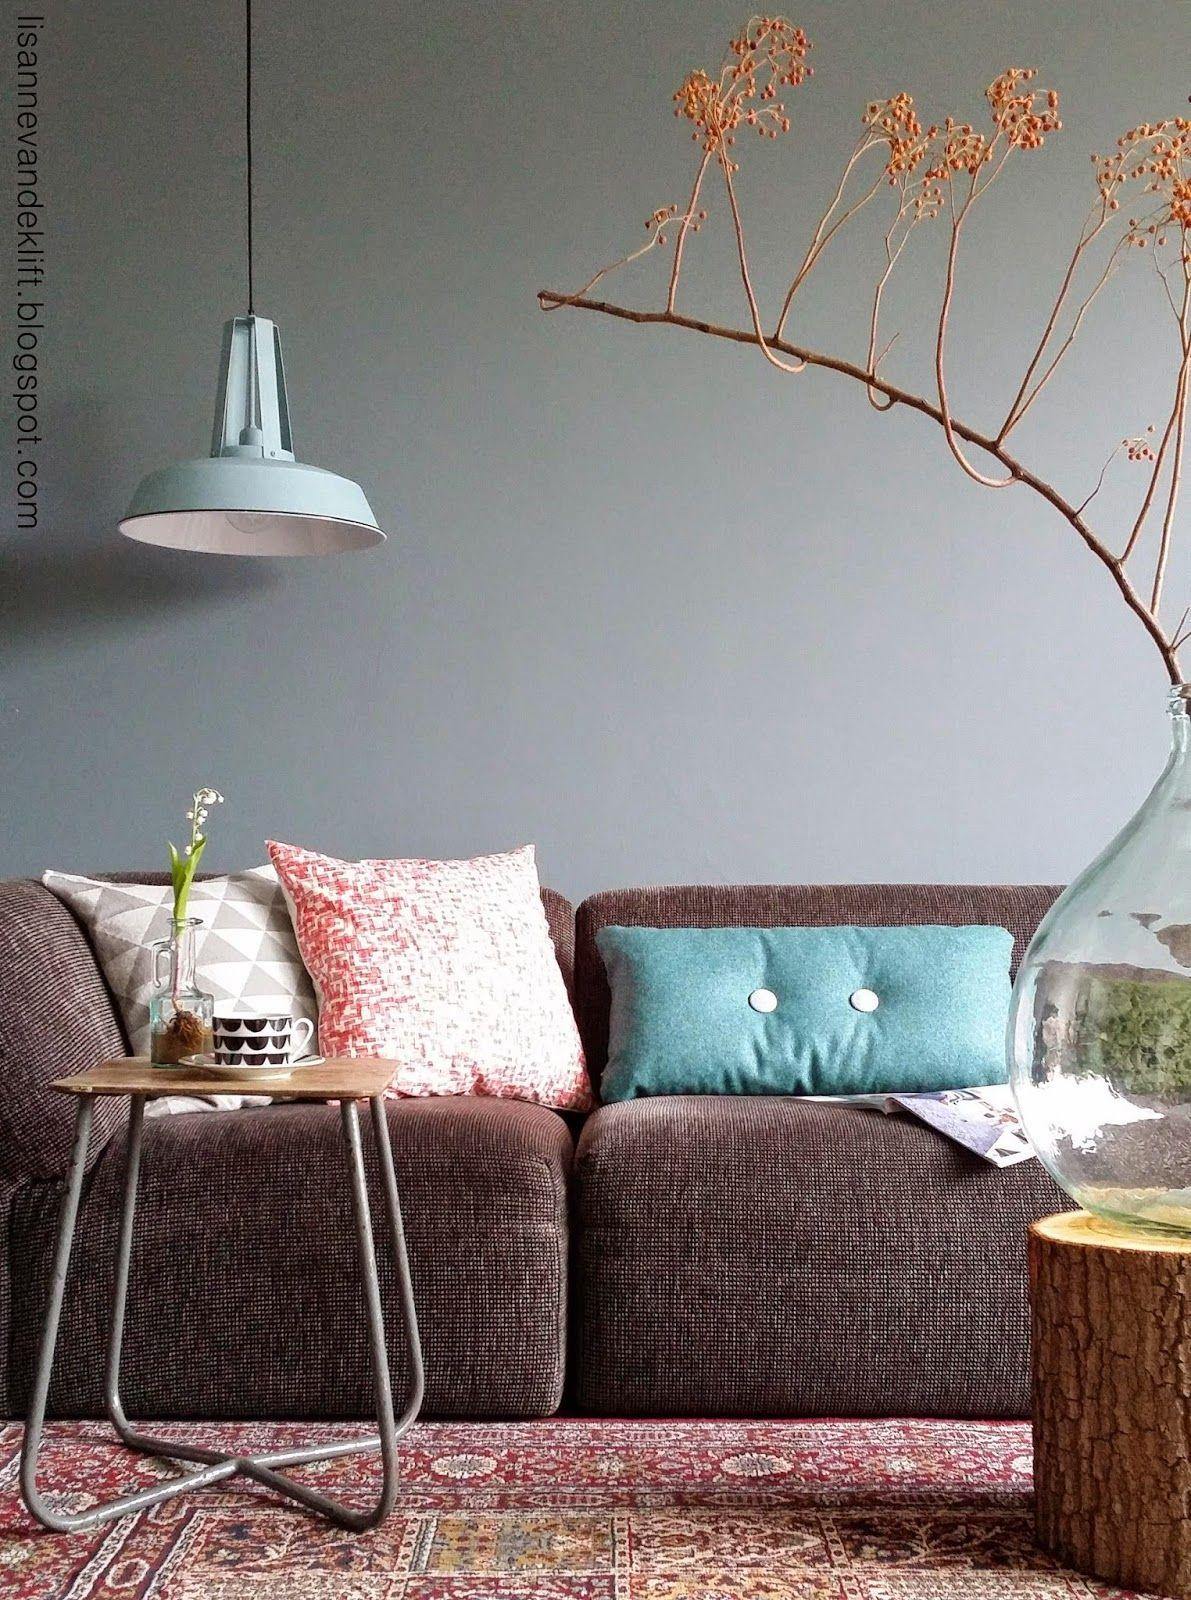 Pure Lisanne van de Klift  Living rooms and Interiors